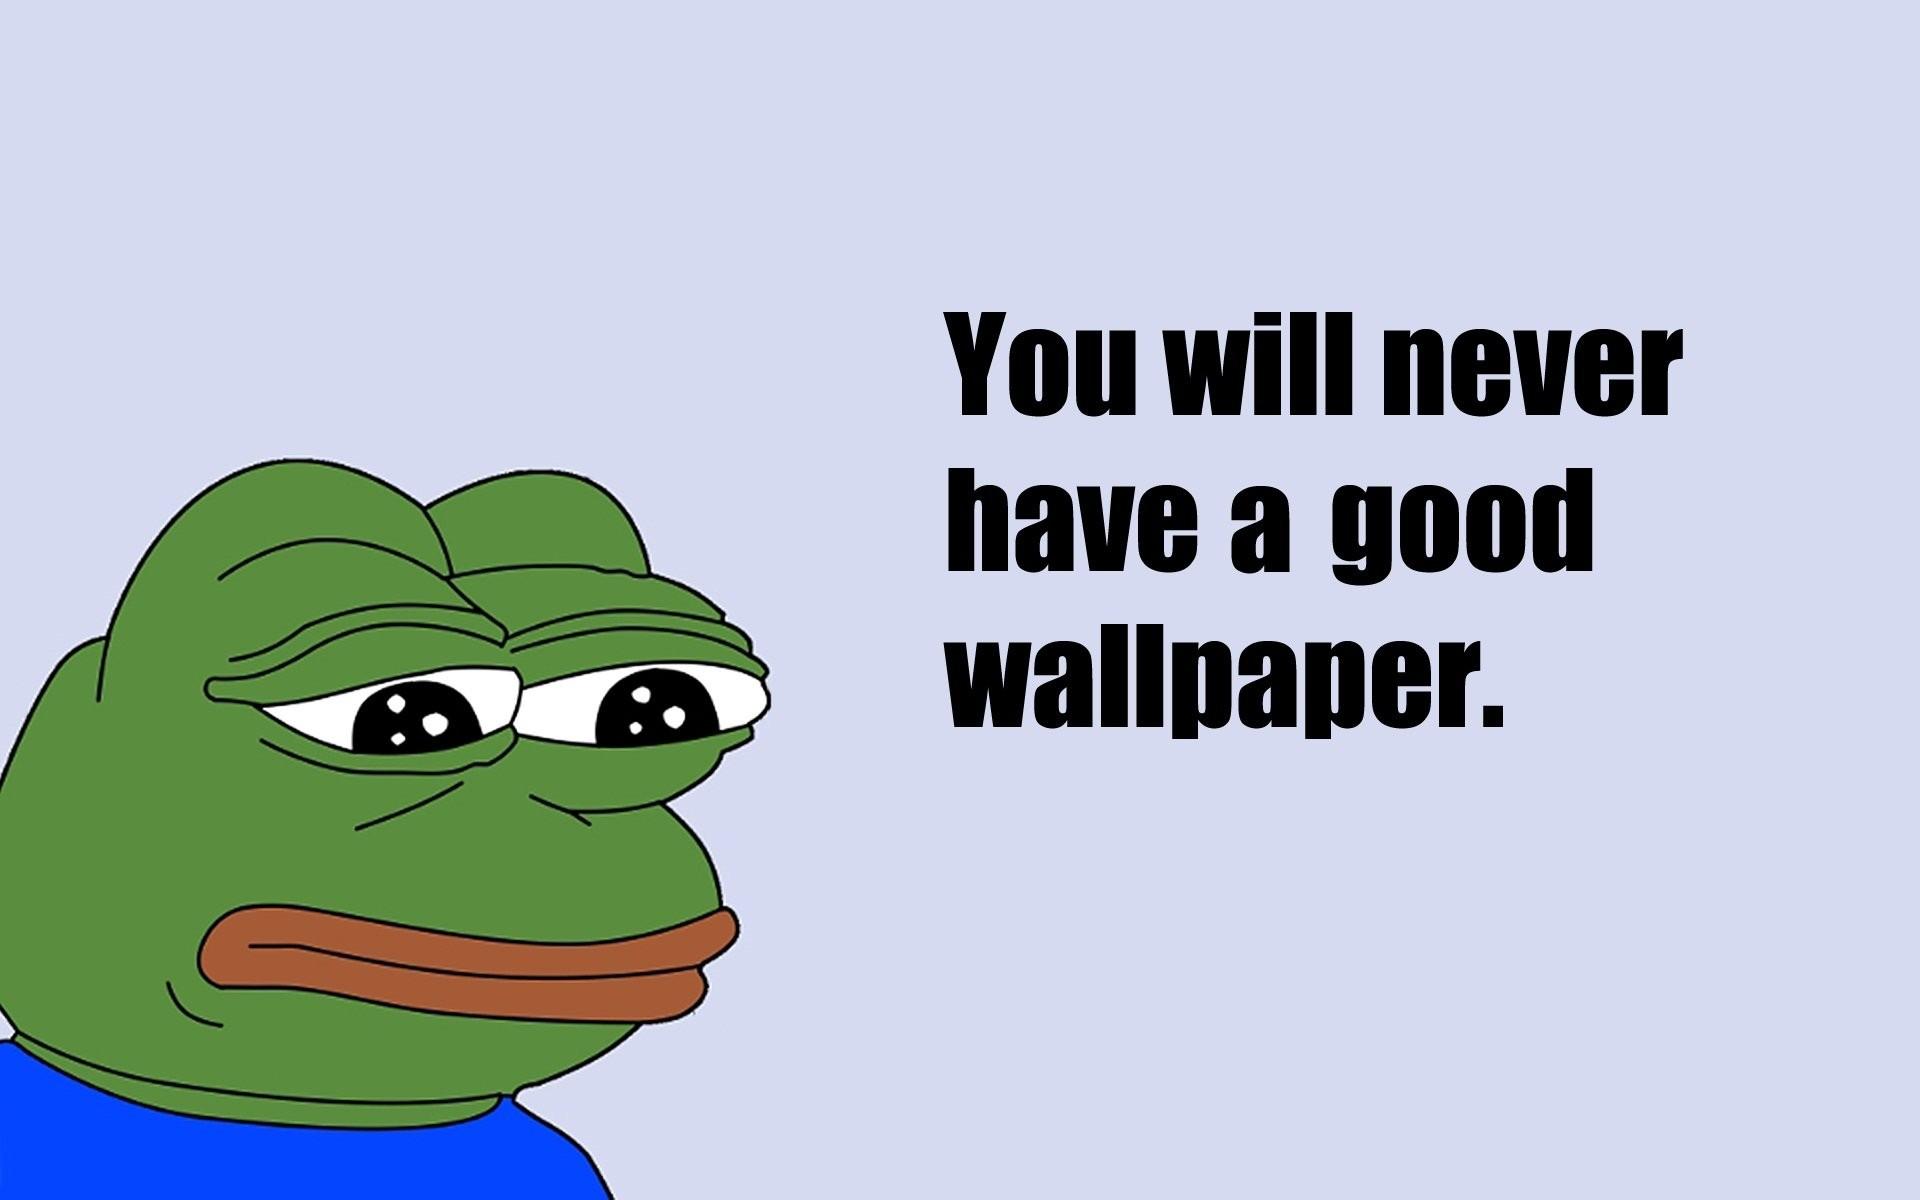 Funny Meme Wallpapers For Iphone : Sad meme desktop wallpaper px